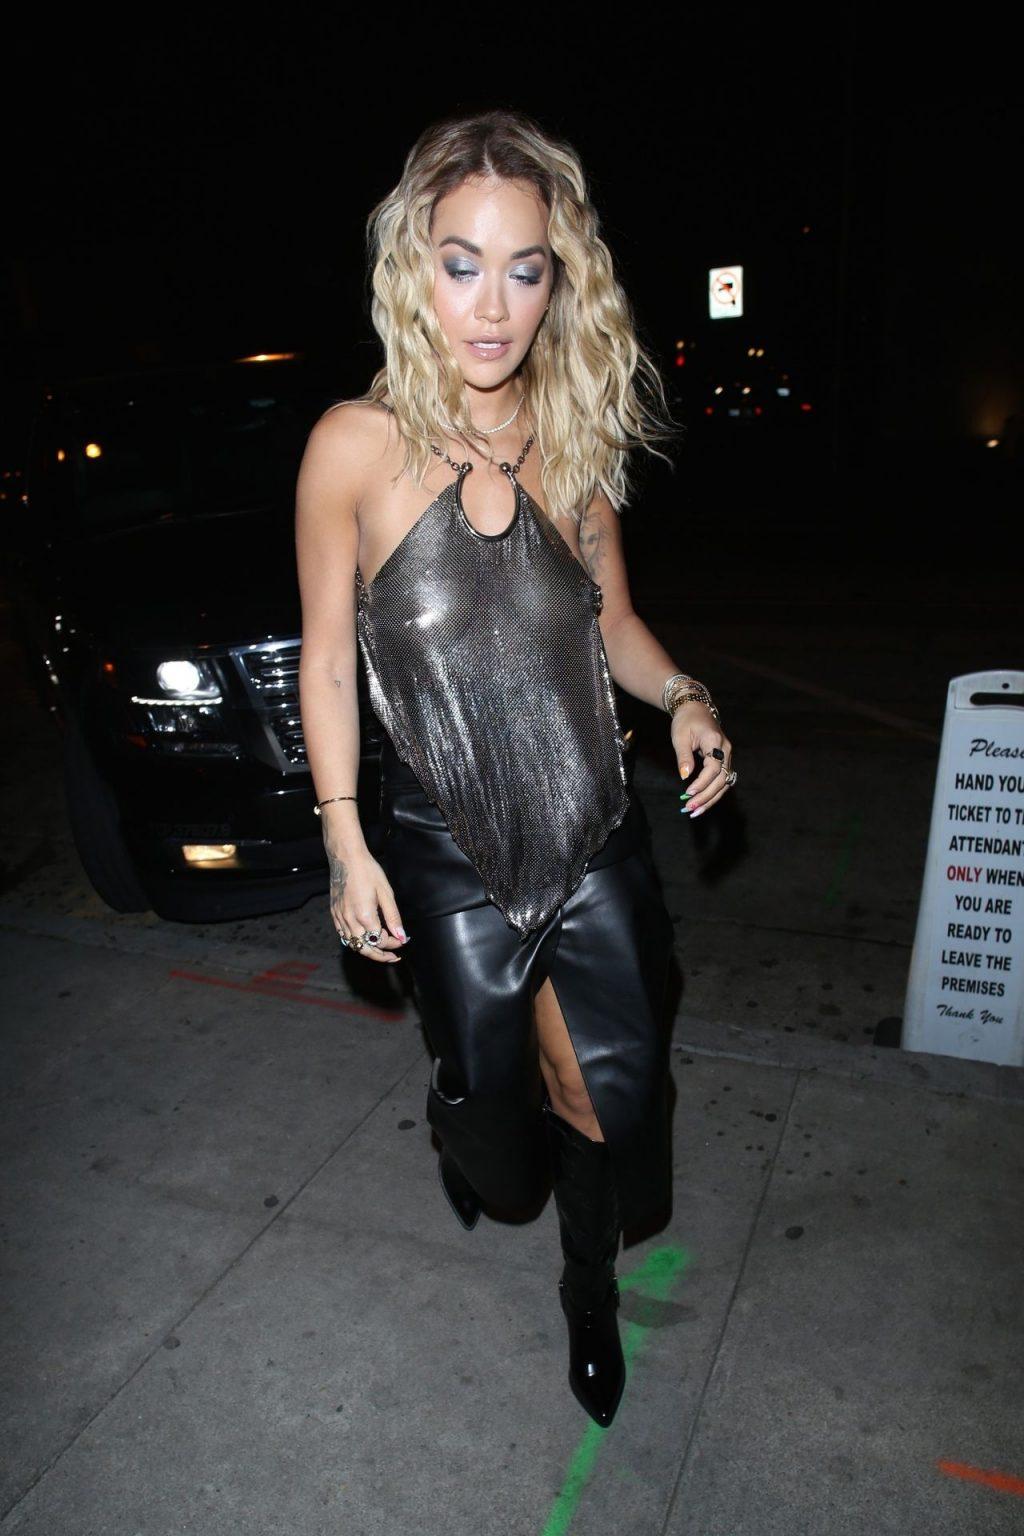 Rita Ora Arrives at Craig's in a Sexy Backless See-Through Top (79 Photos)